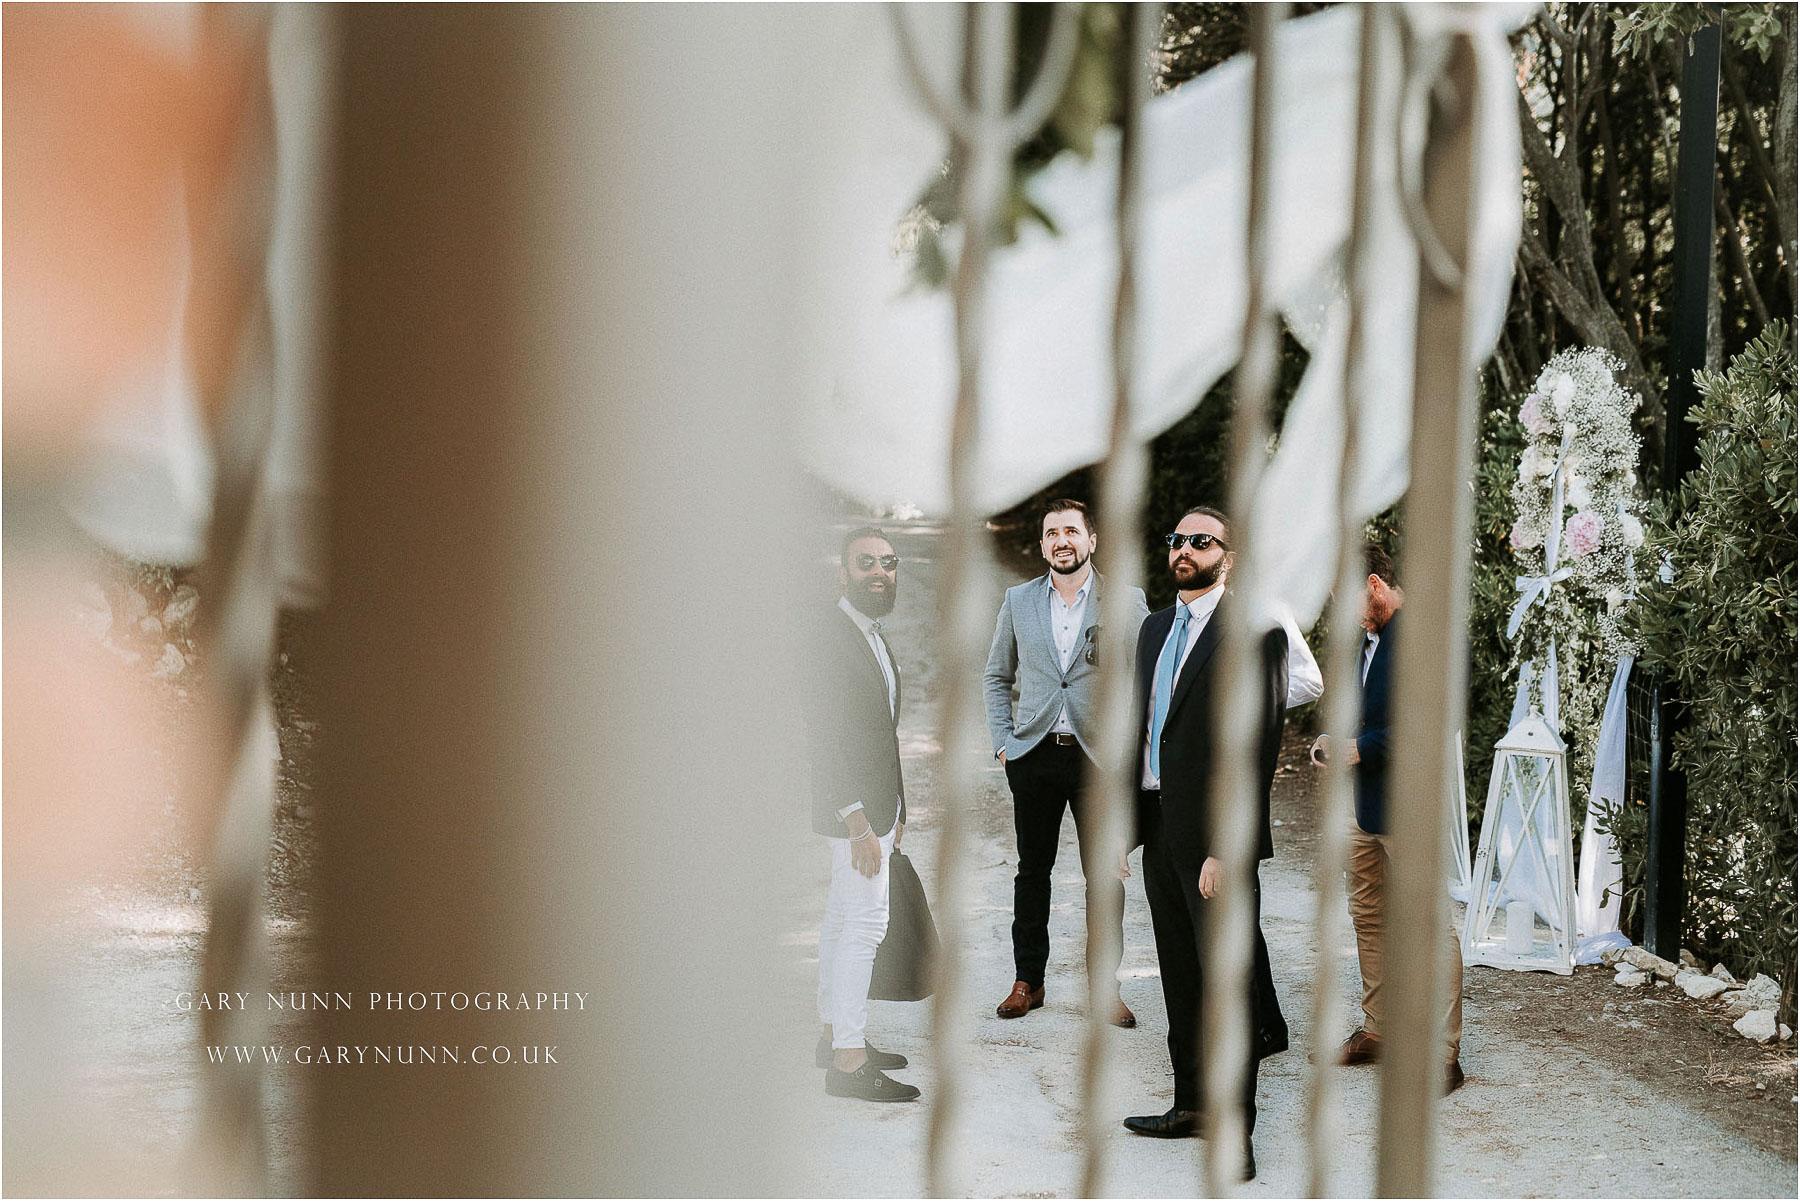 wedding in portonovo, Torre Clementina, portonovo weddings, destination wedding photographer Italy, beautiful wedding dresses, Ancona, Portonovo,